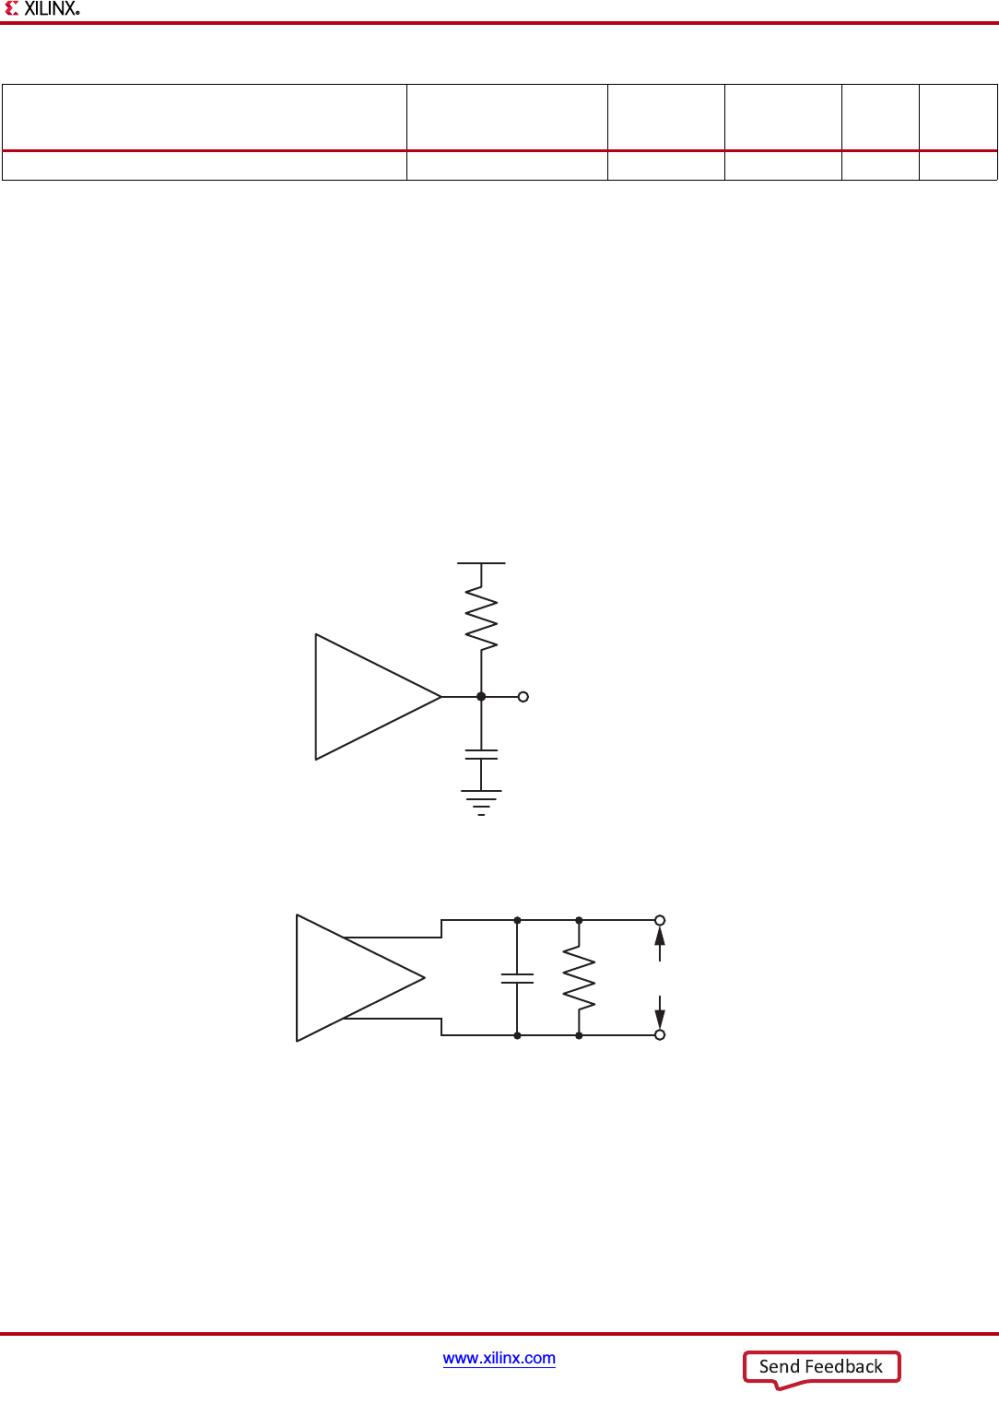 medium resolution of kintex 7 fpgas data sheet dc and ac switching characteristics